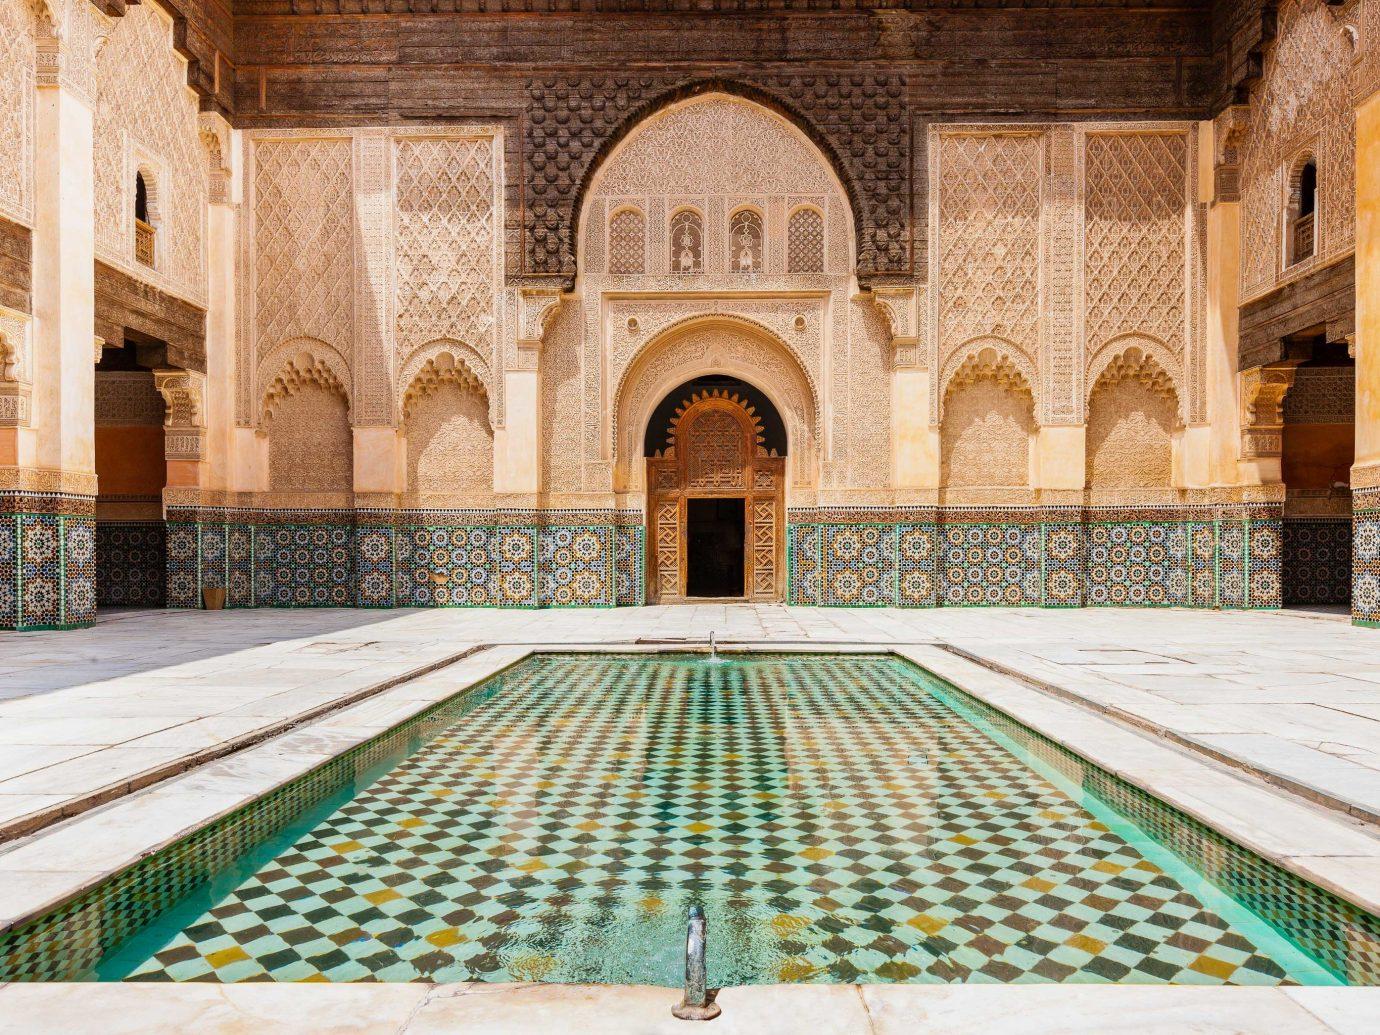 Arts + Culture Marrakech Morocco Style + Design arch Architecture building historic site symmetry place of worship caravanserai ancient history facade window column history